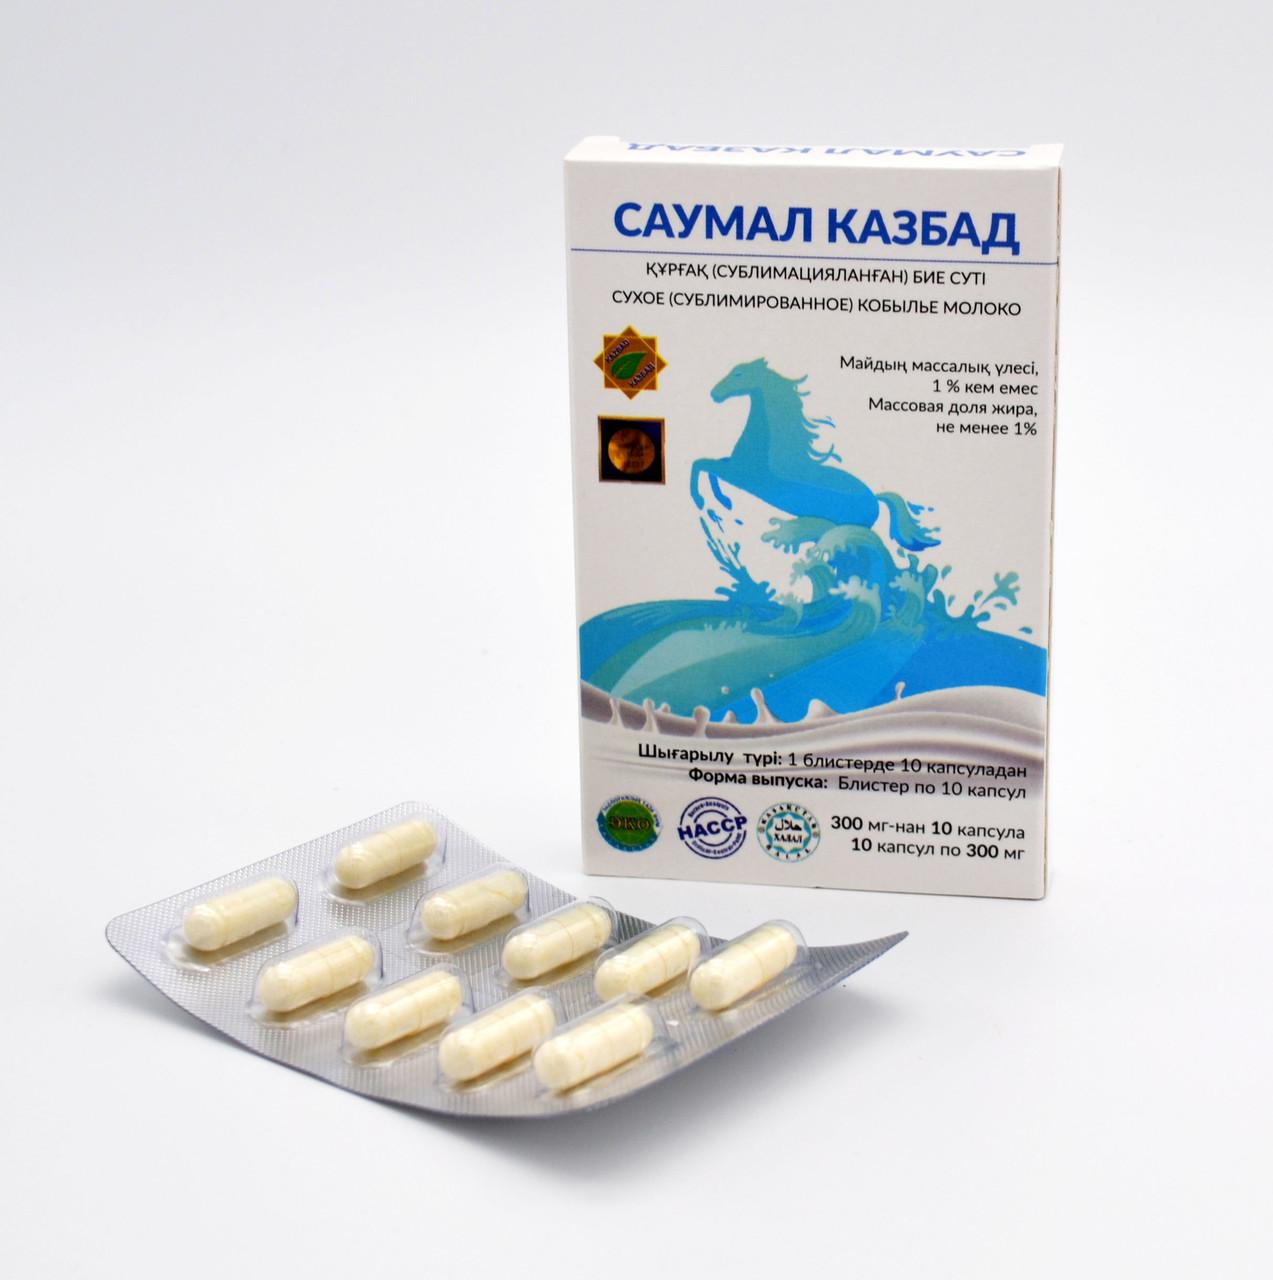 Саумал КазБад Сухое (сублимированное ) кобылье молокo №10